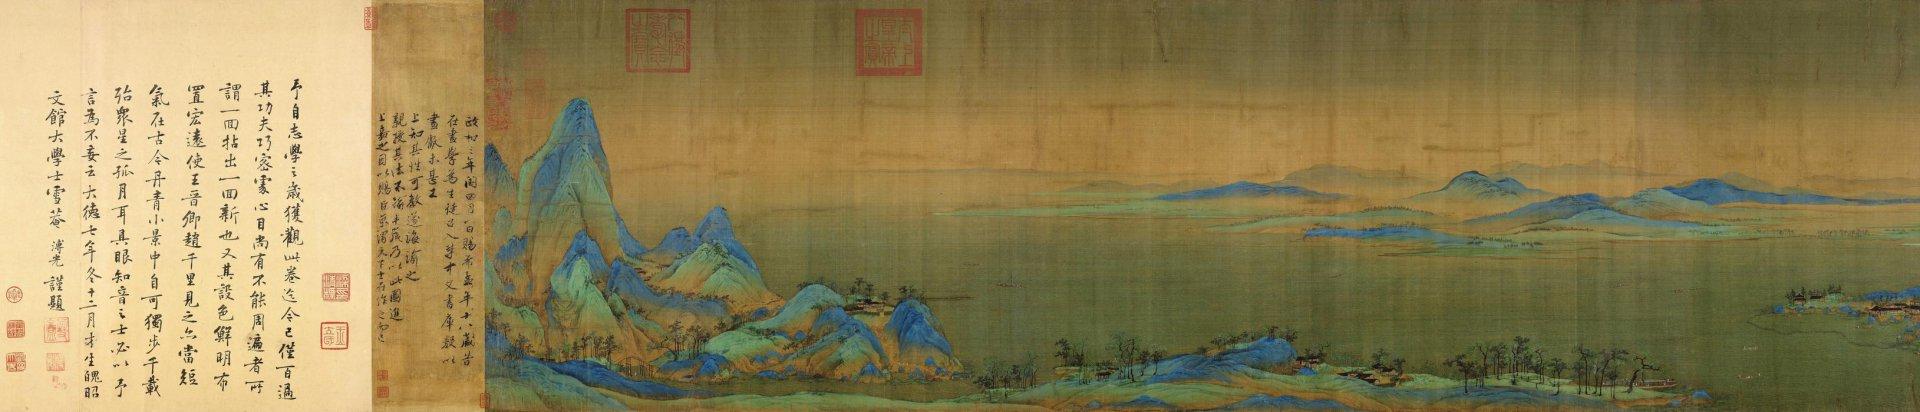 1.tWang_Ximeng_-_A_Thousand_Li_of_River_(End).jpg